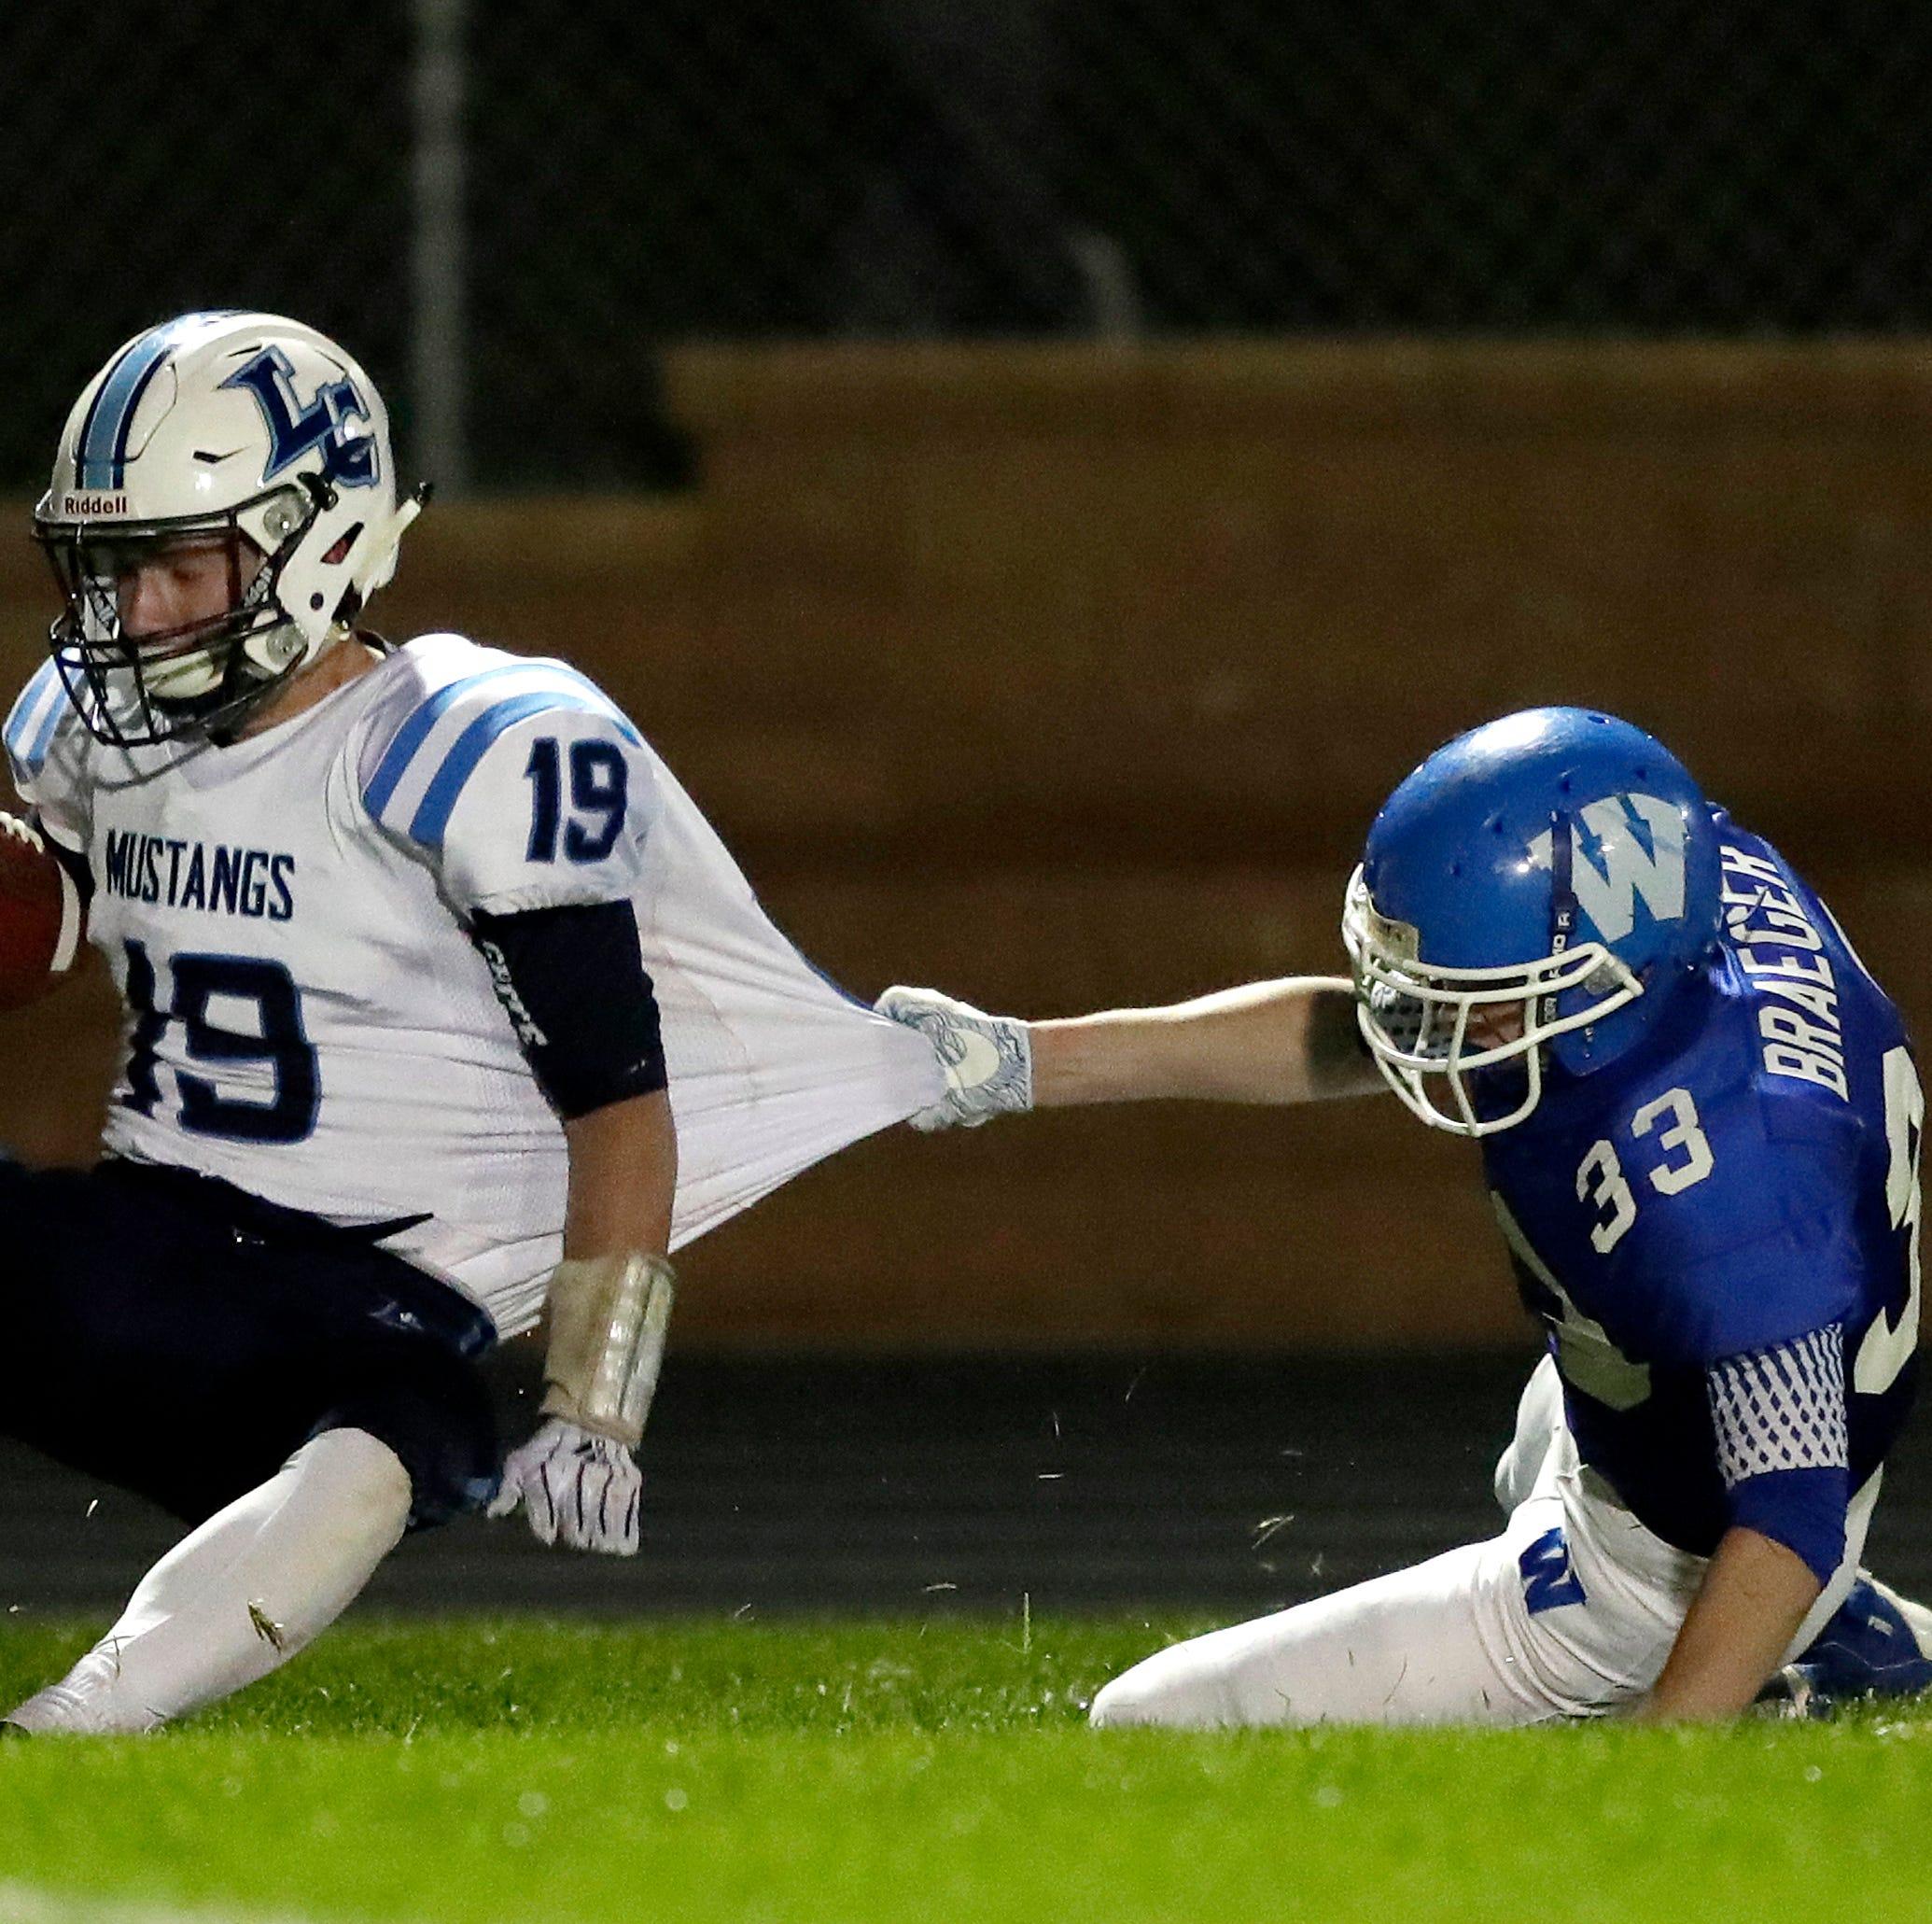 High school football: WIAA playoff pairings released